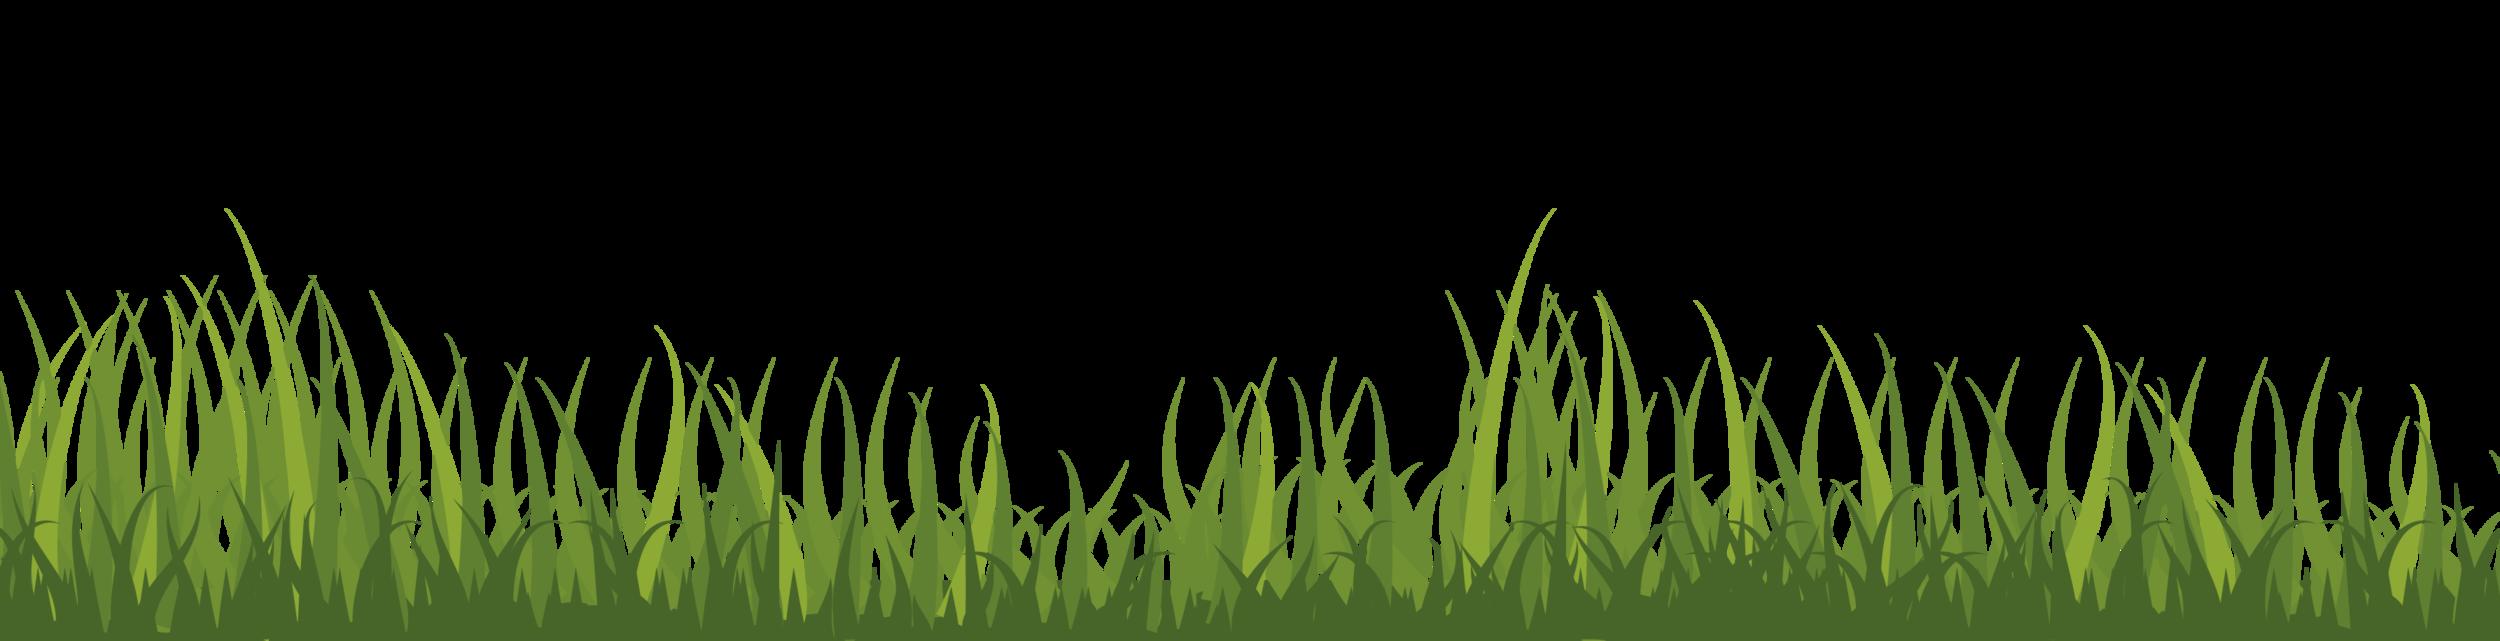 grassvector